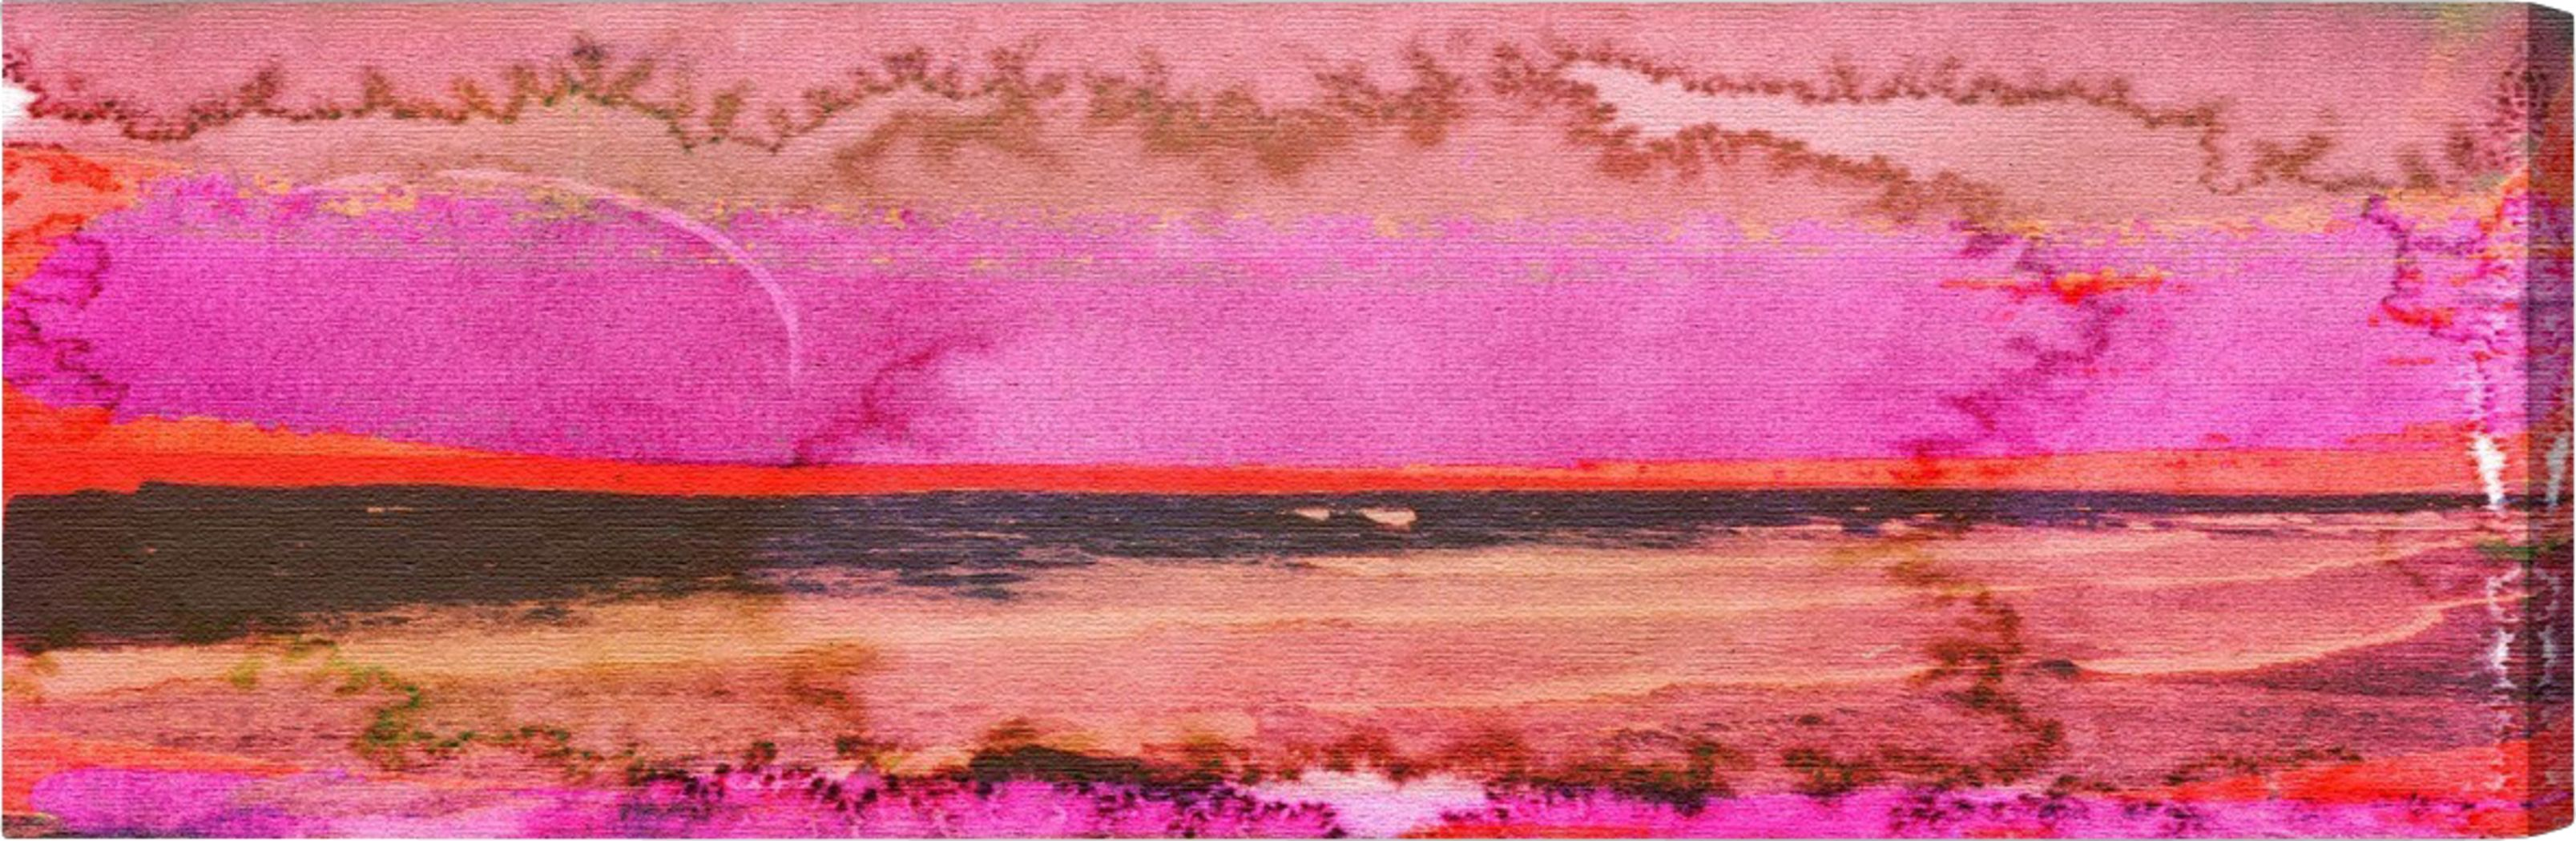 Vibrant Shoreline Orange Artwork